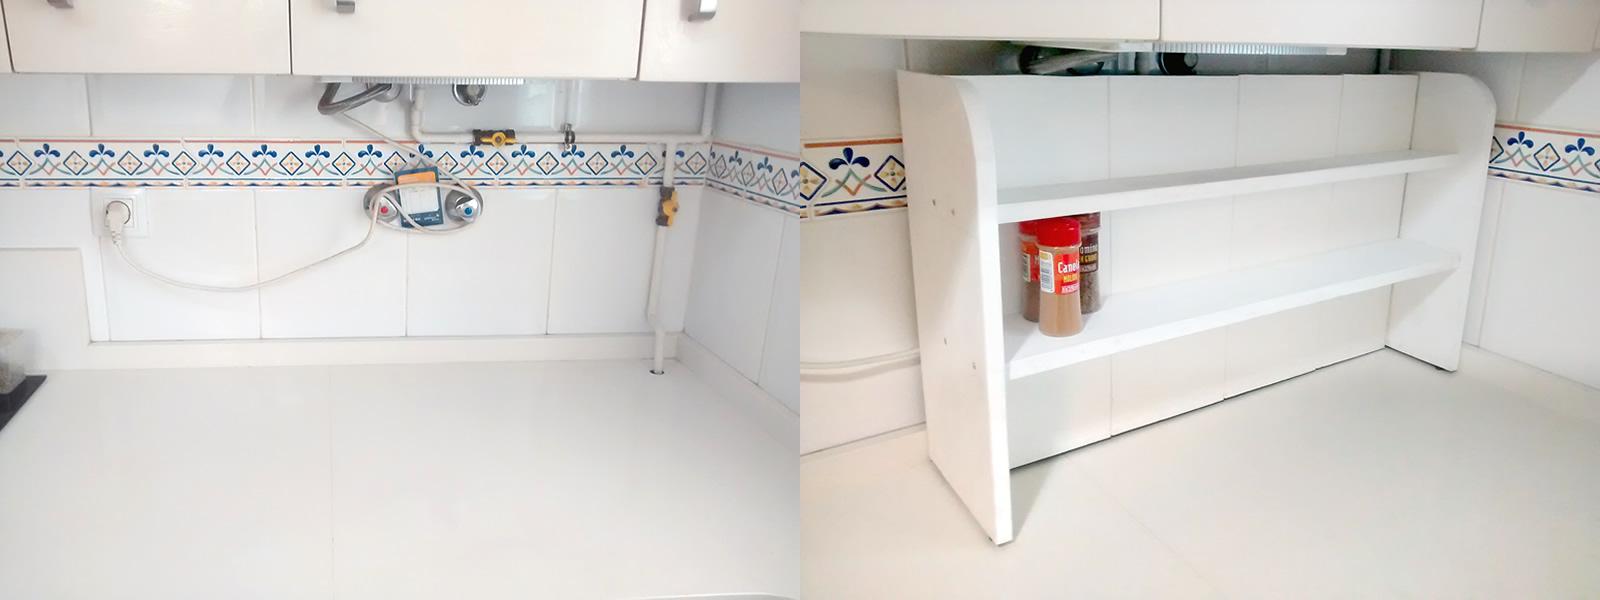 C mo hacer un estante especiero para camuflar tuber as - Atasco tuberia cocina ...